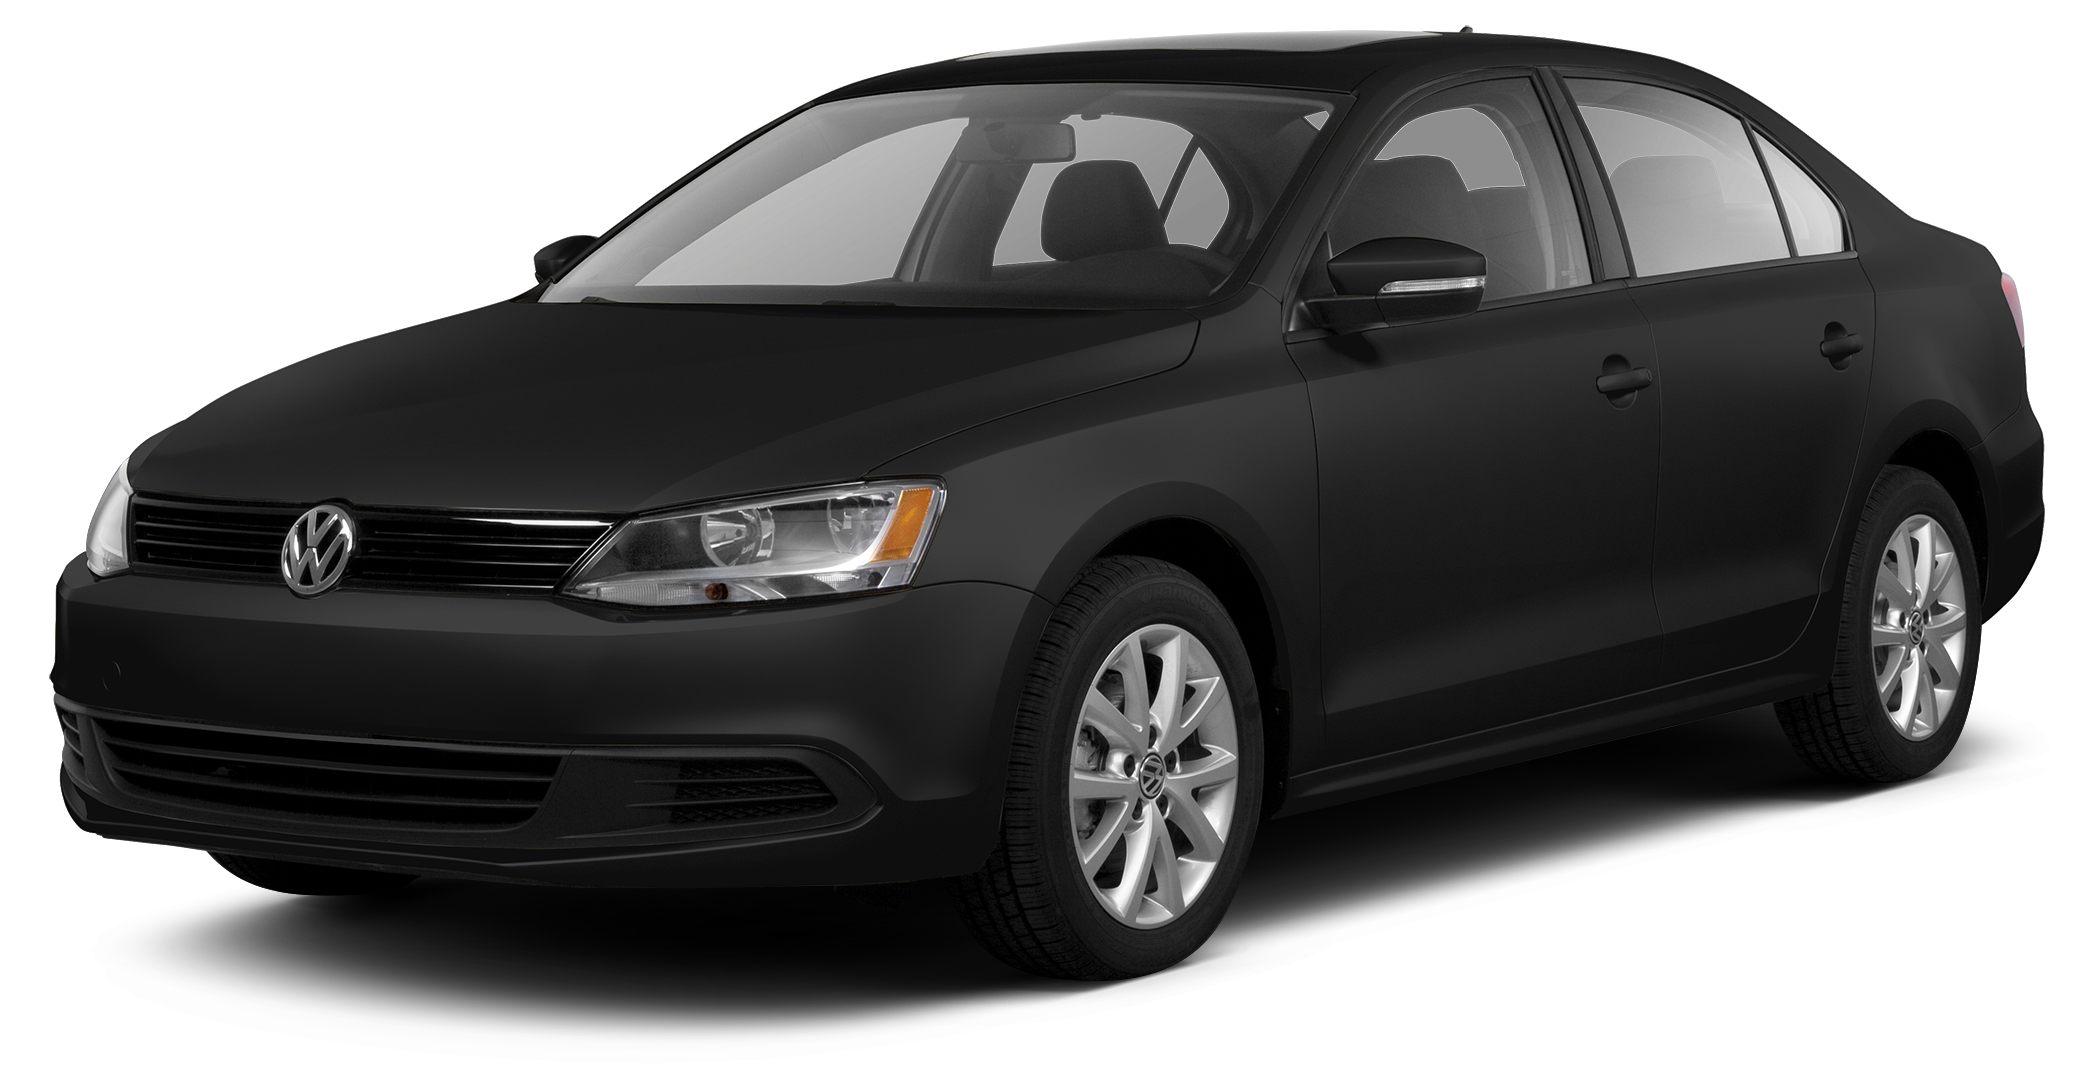 2013 Volkswagen Jetta 20 TDI Miles 15710Color Black Uni Stock G8248A VIN 3VWLL7AJ0DM367694